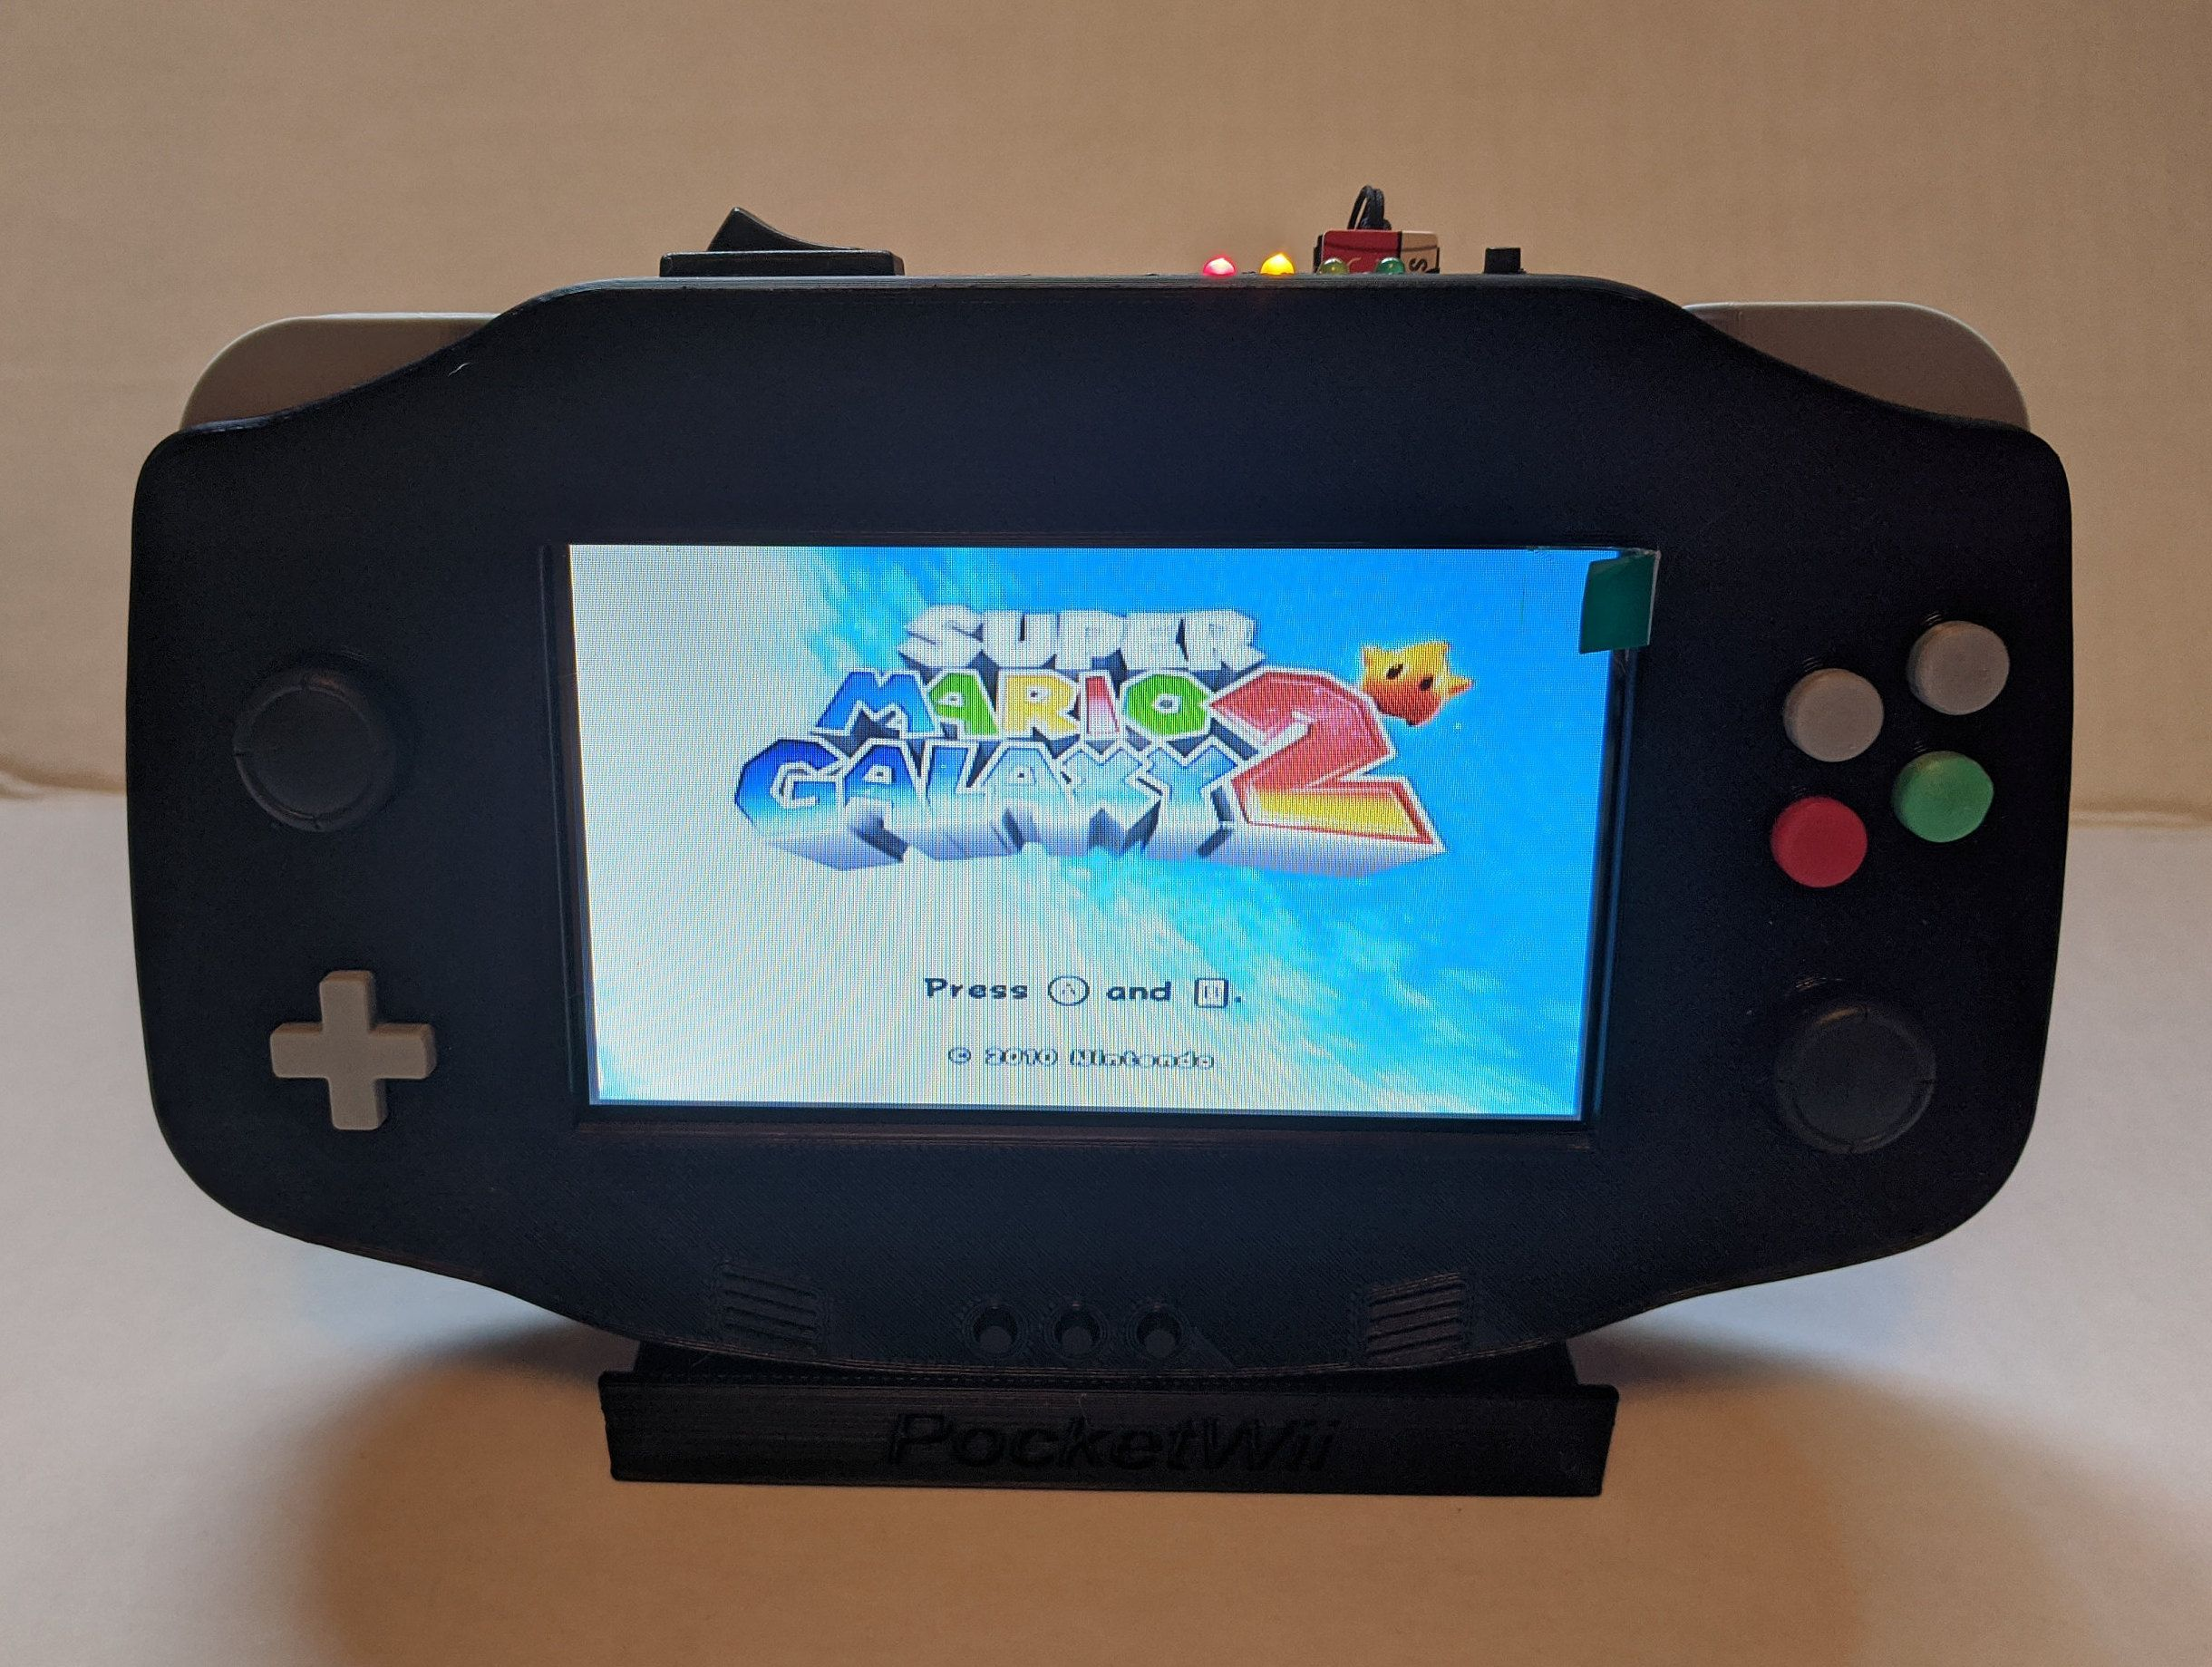 Raspberry Pi Gamecube Portable